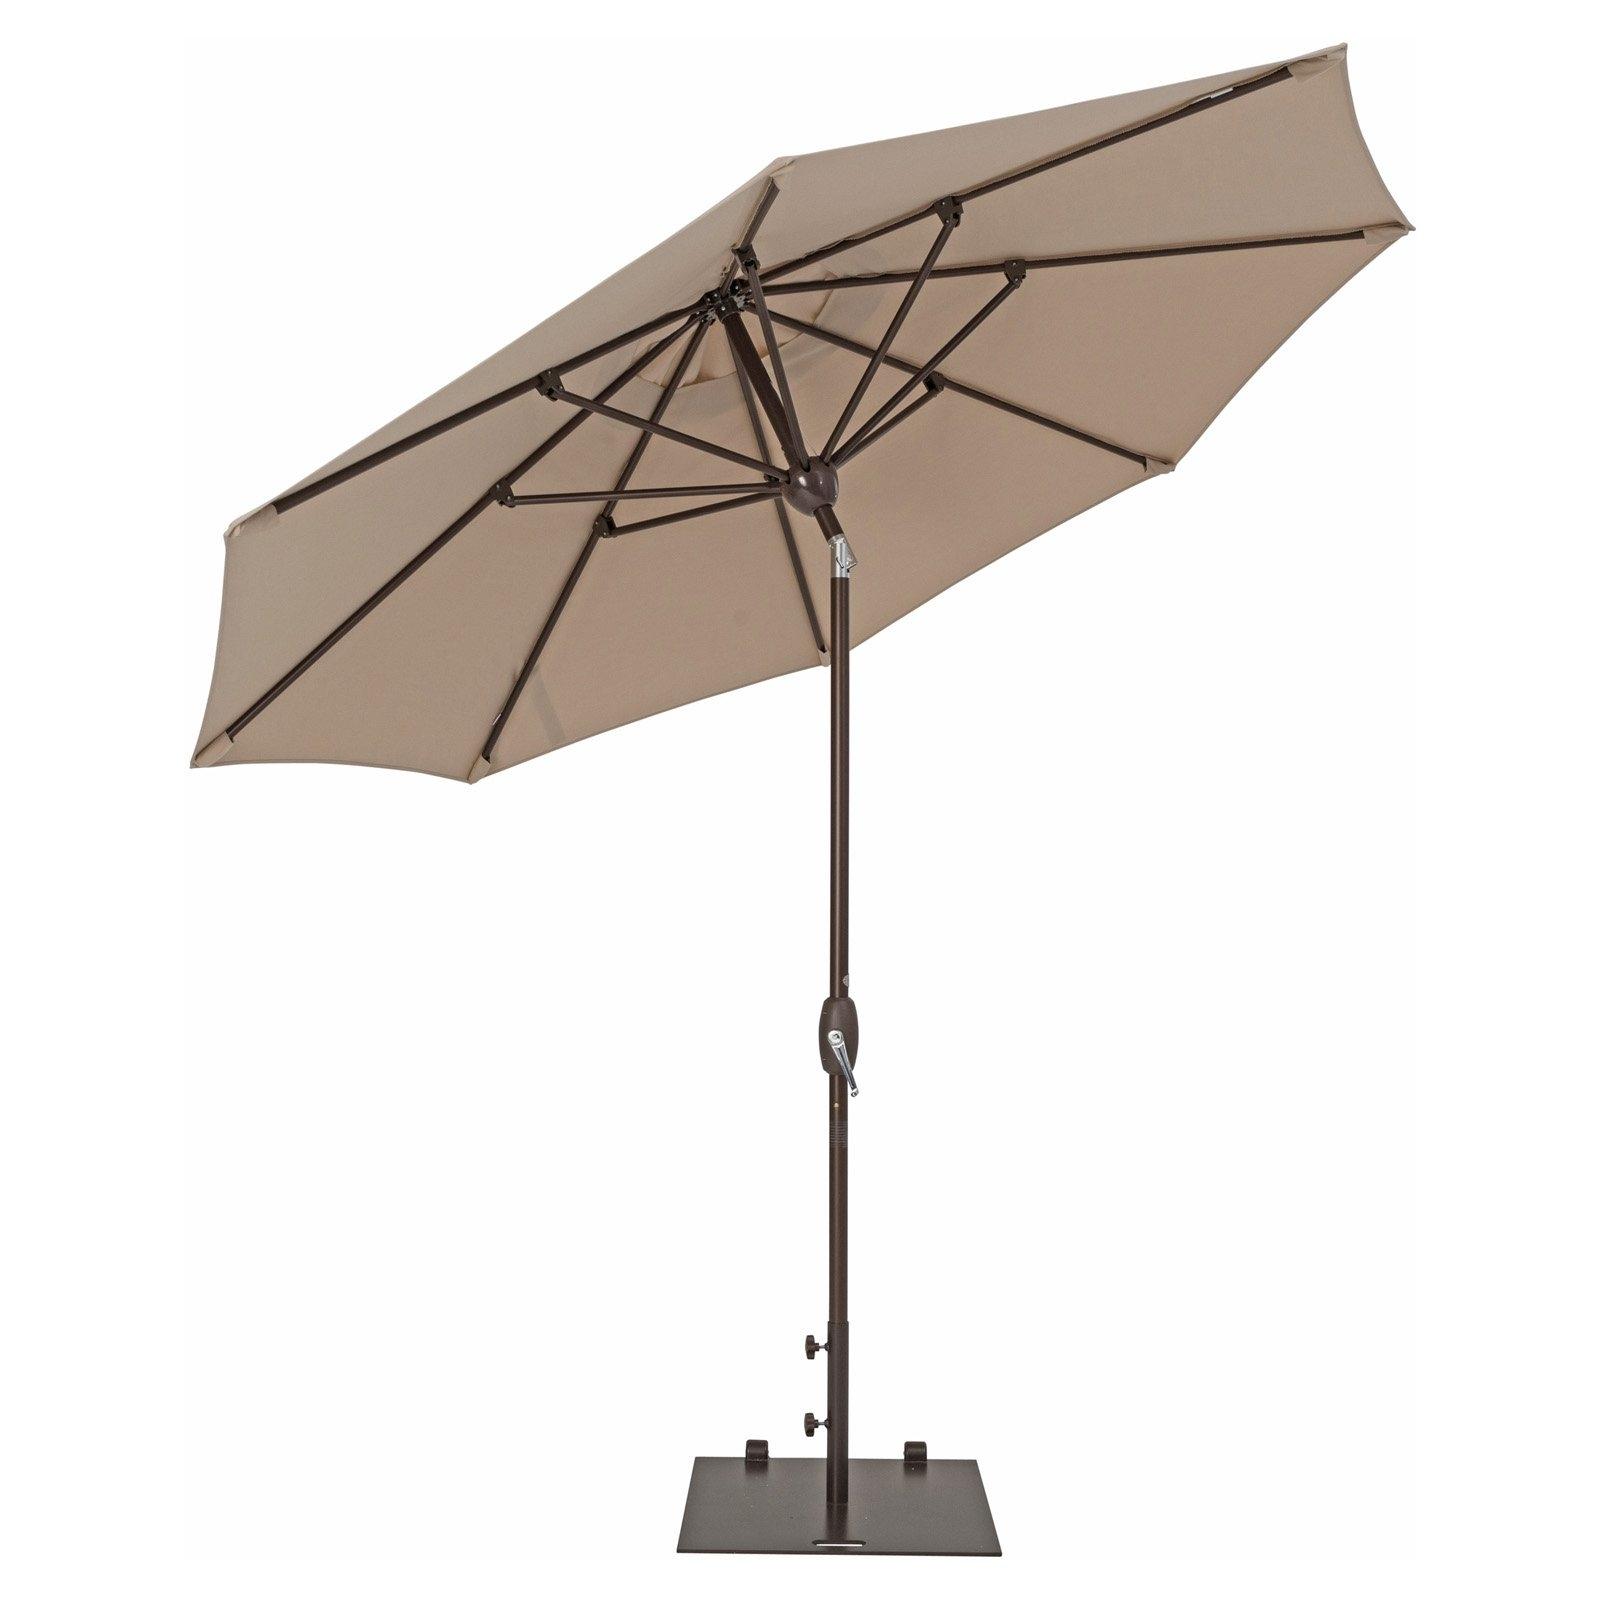 Trueshade Plus 9' Market Umbrella With Sunbrella Fabric, Auto Tilt Inside Trendy Patio Umbrellas With Sunbrella Fabric (View 10 of 20)